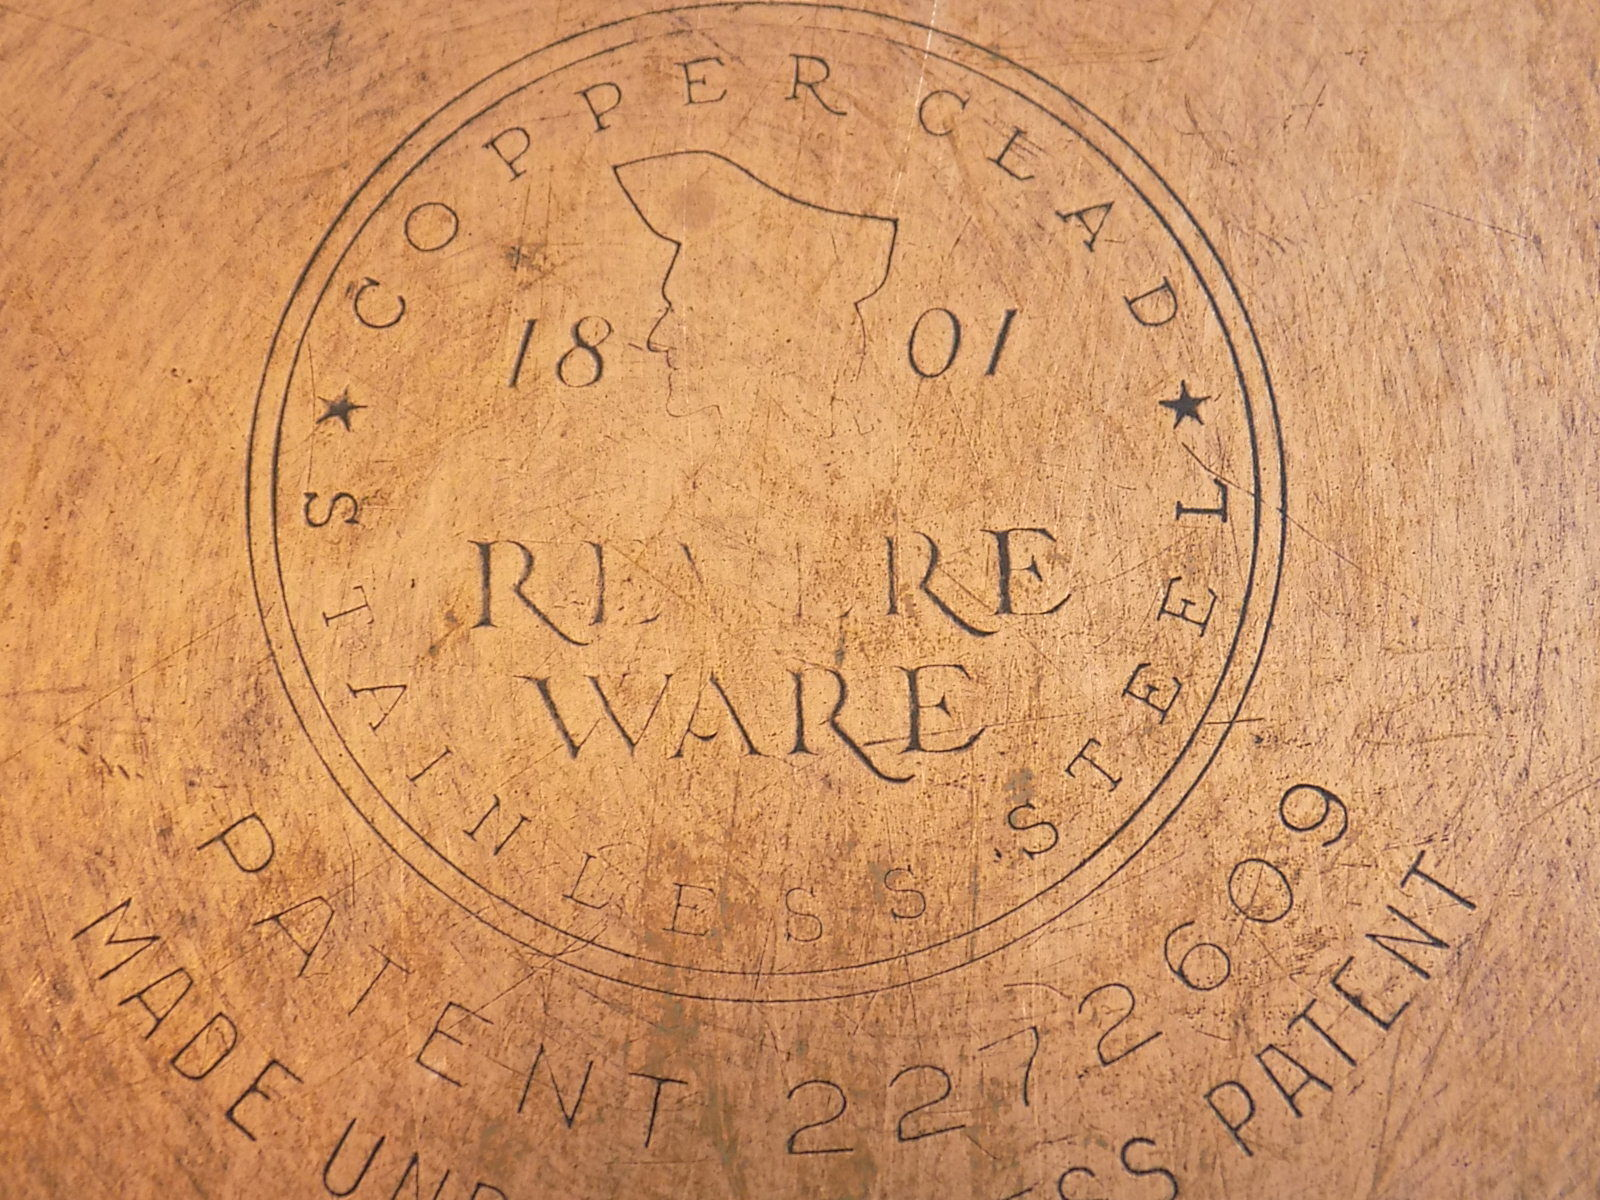 REVERE WARE 10 inch SKILLET Vintage COPPER BOTTOM FRYING PAN 2363973 w/ Lid